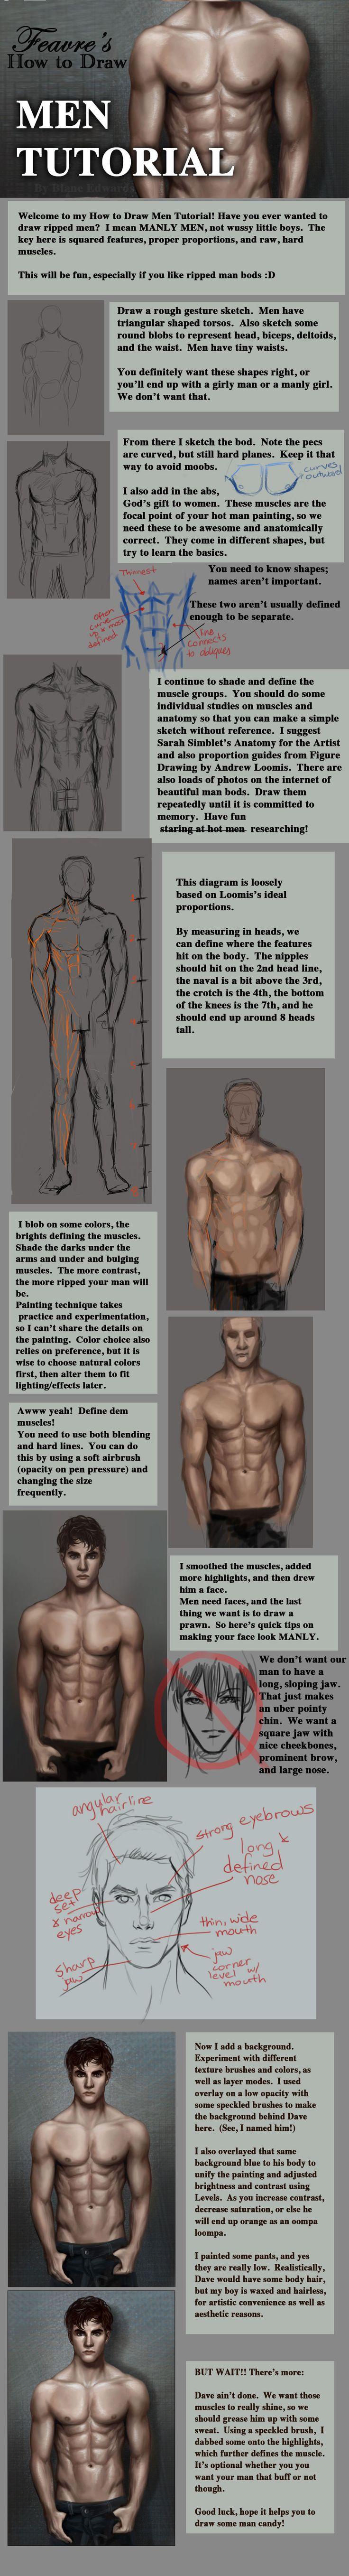 How to Draw Men Tutorial by feavre.deviantart.com on @deviantART